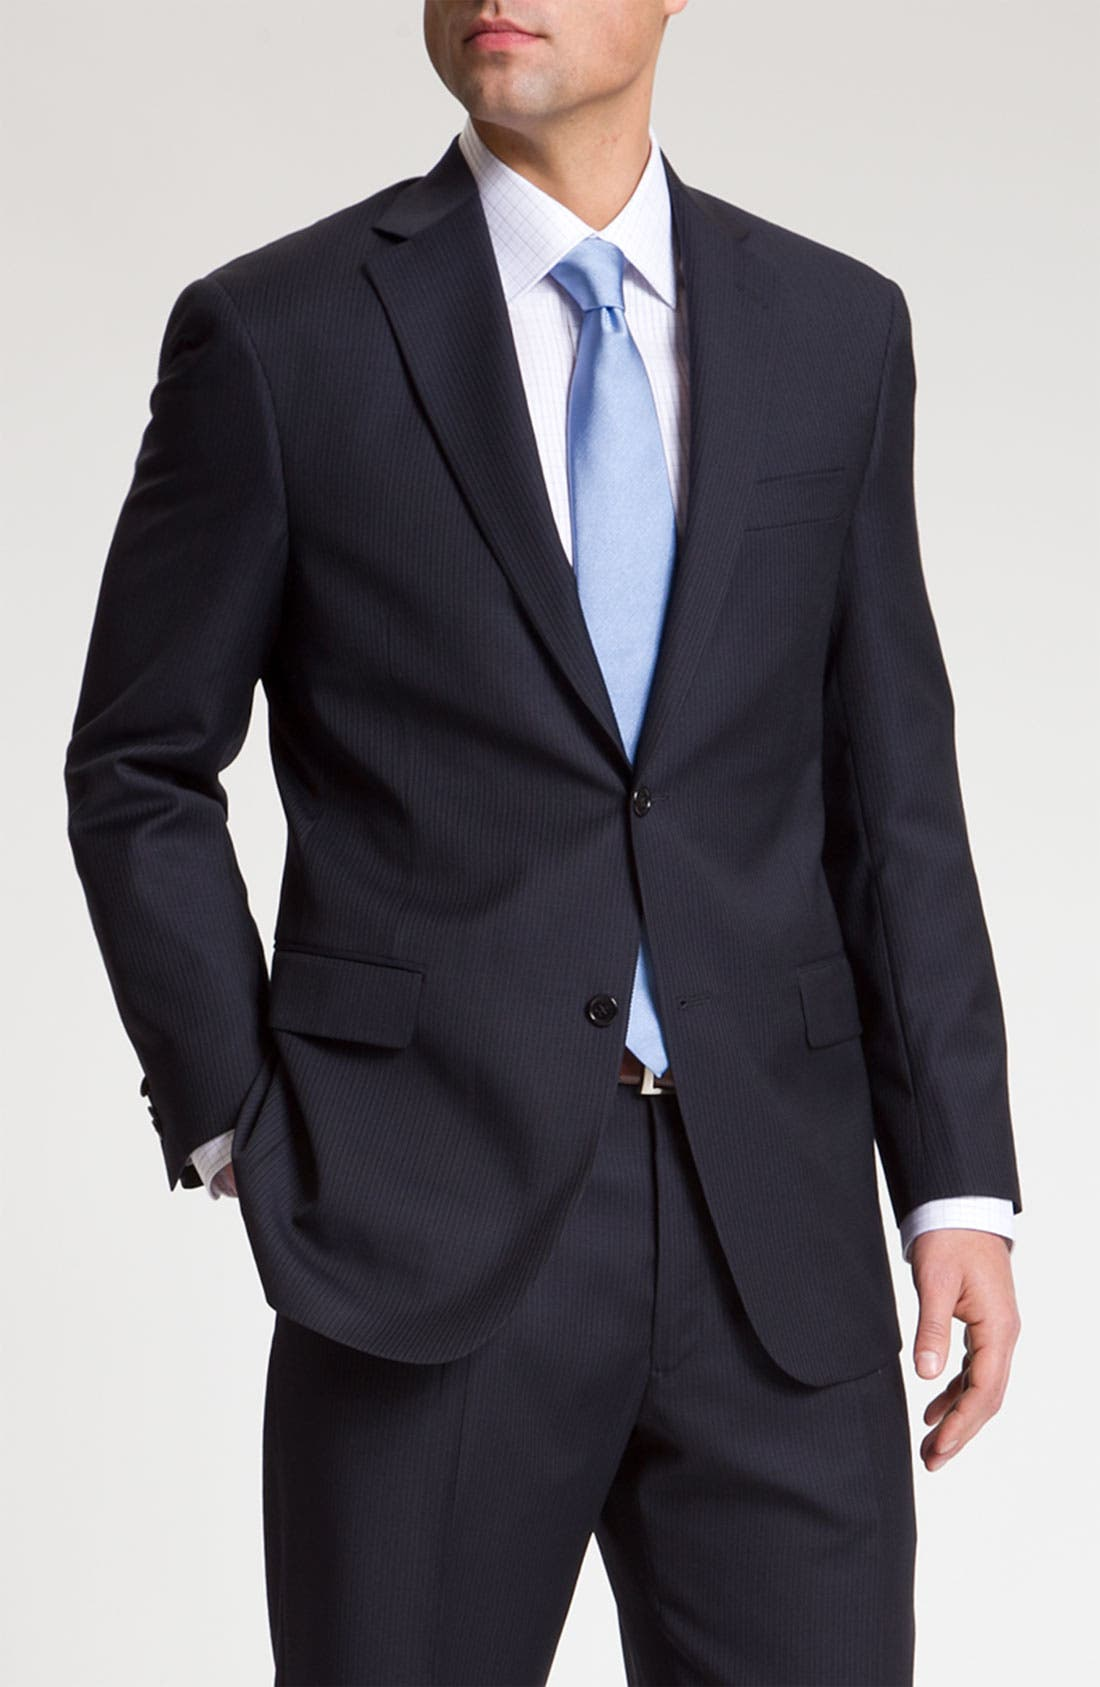 Main Image - Hart Schaffner Marx Pinstripe Wool Suit